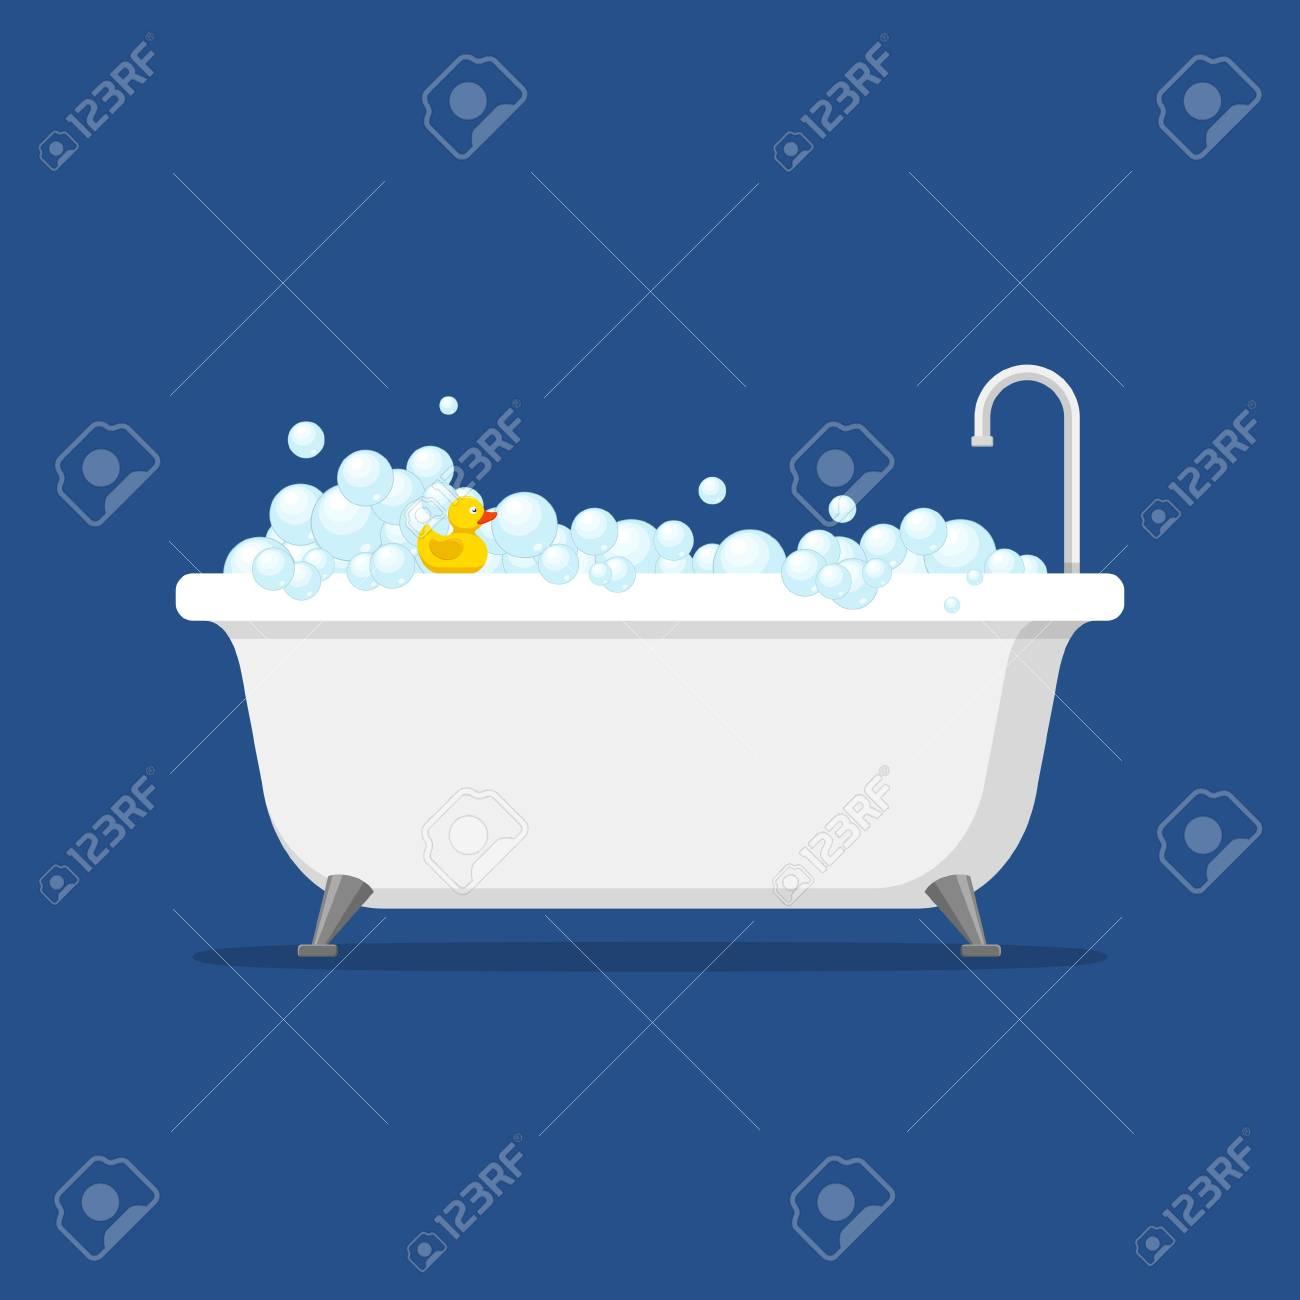 Bathtub With Foam Bubbles Inside And Bath Yellow Rubber Duck ...